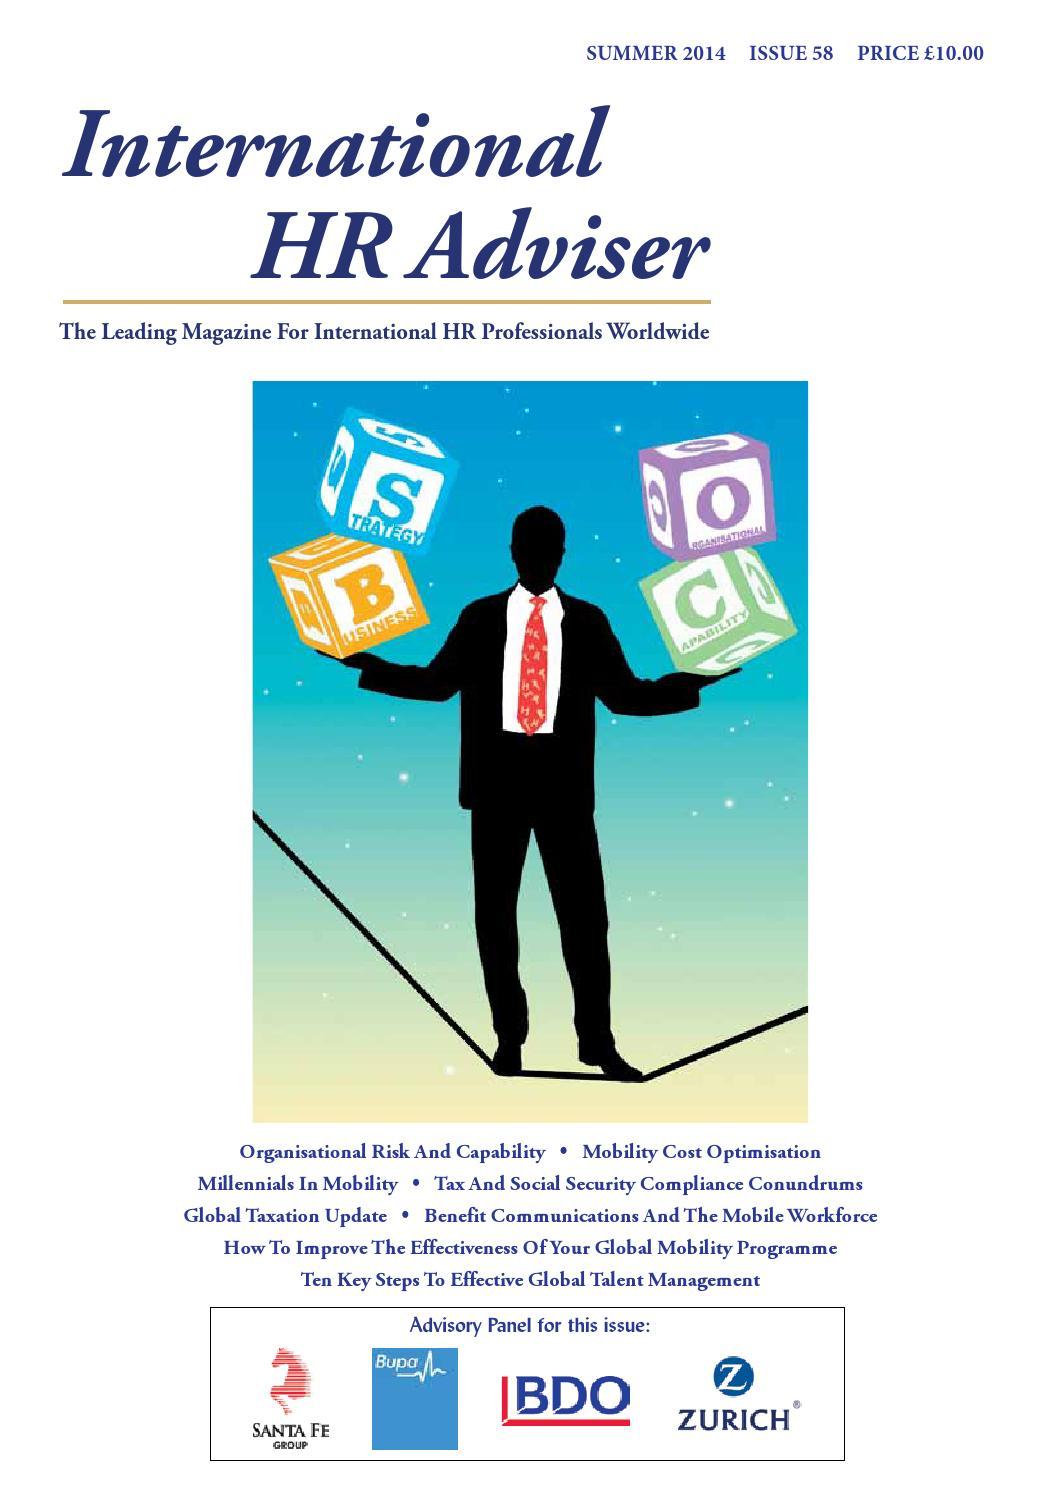 International HR Adviser Summer 2014 by International HR Adviser - issuu